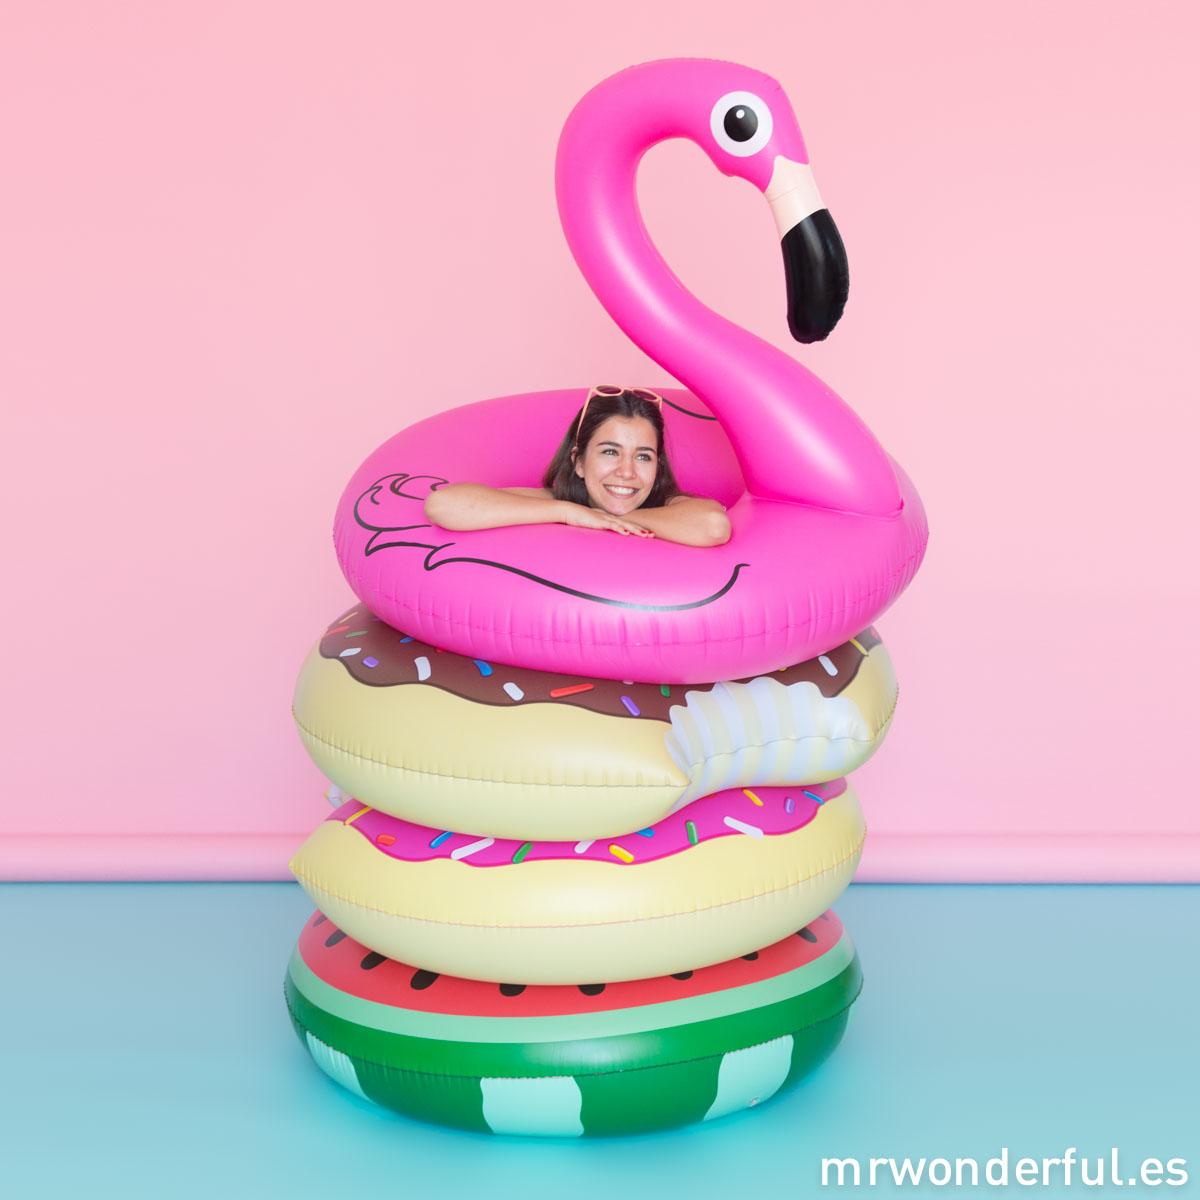 mrwonderful_PRA02918_flotador-hinchable_donut-chocolate-14-Editar